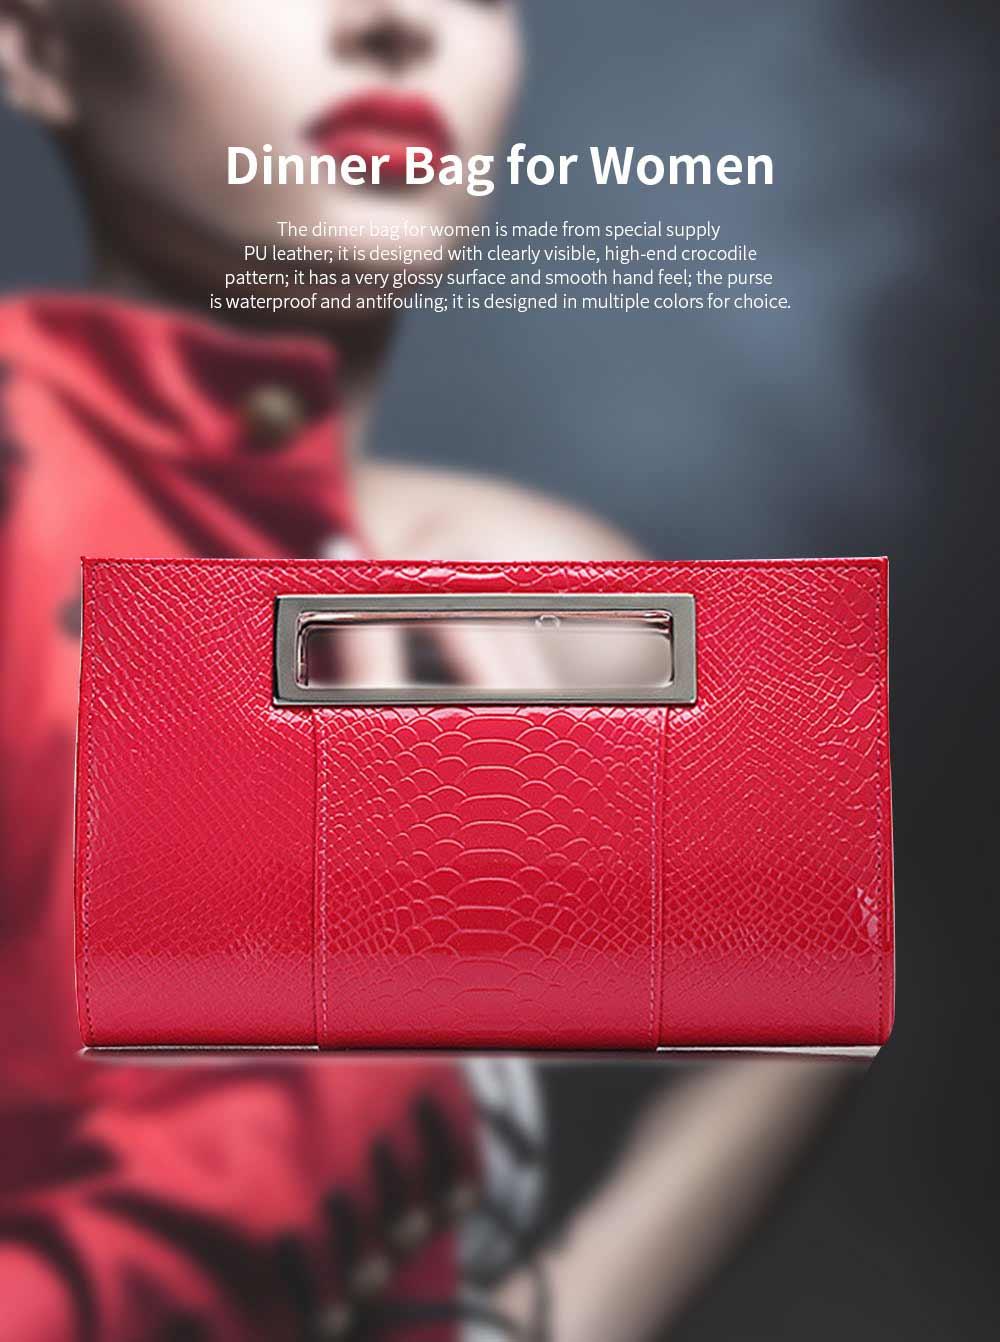 Women Evening Bag Casual PU Leather Dinner Bag with Removable Handle Zipper Pocket Durable Wear Resistant Concealed Pocket Crocodile Pattern Handbag 0